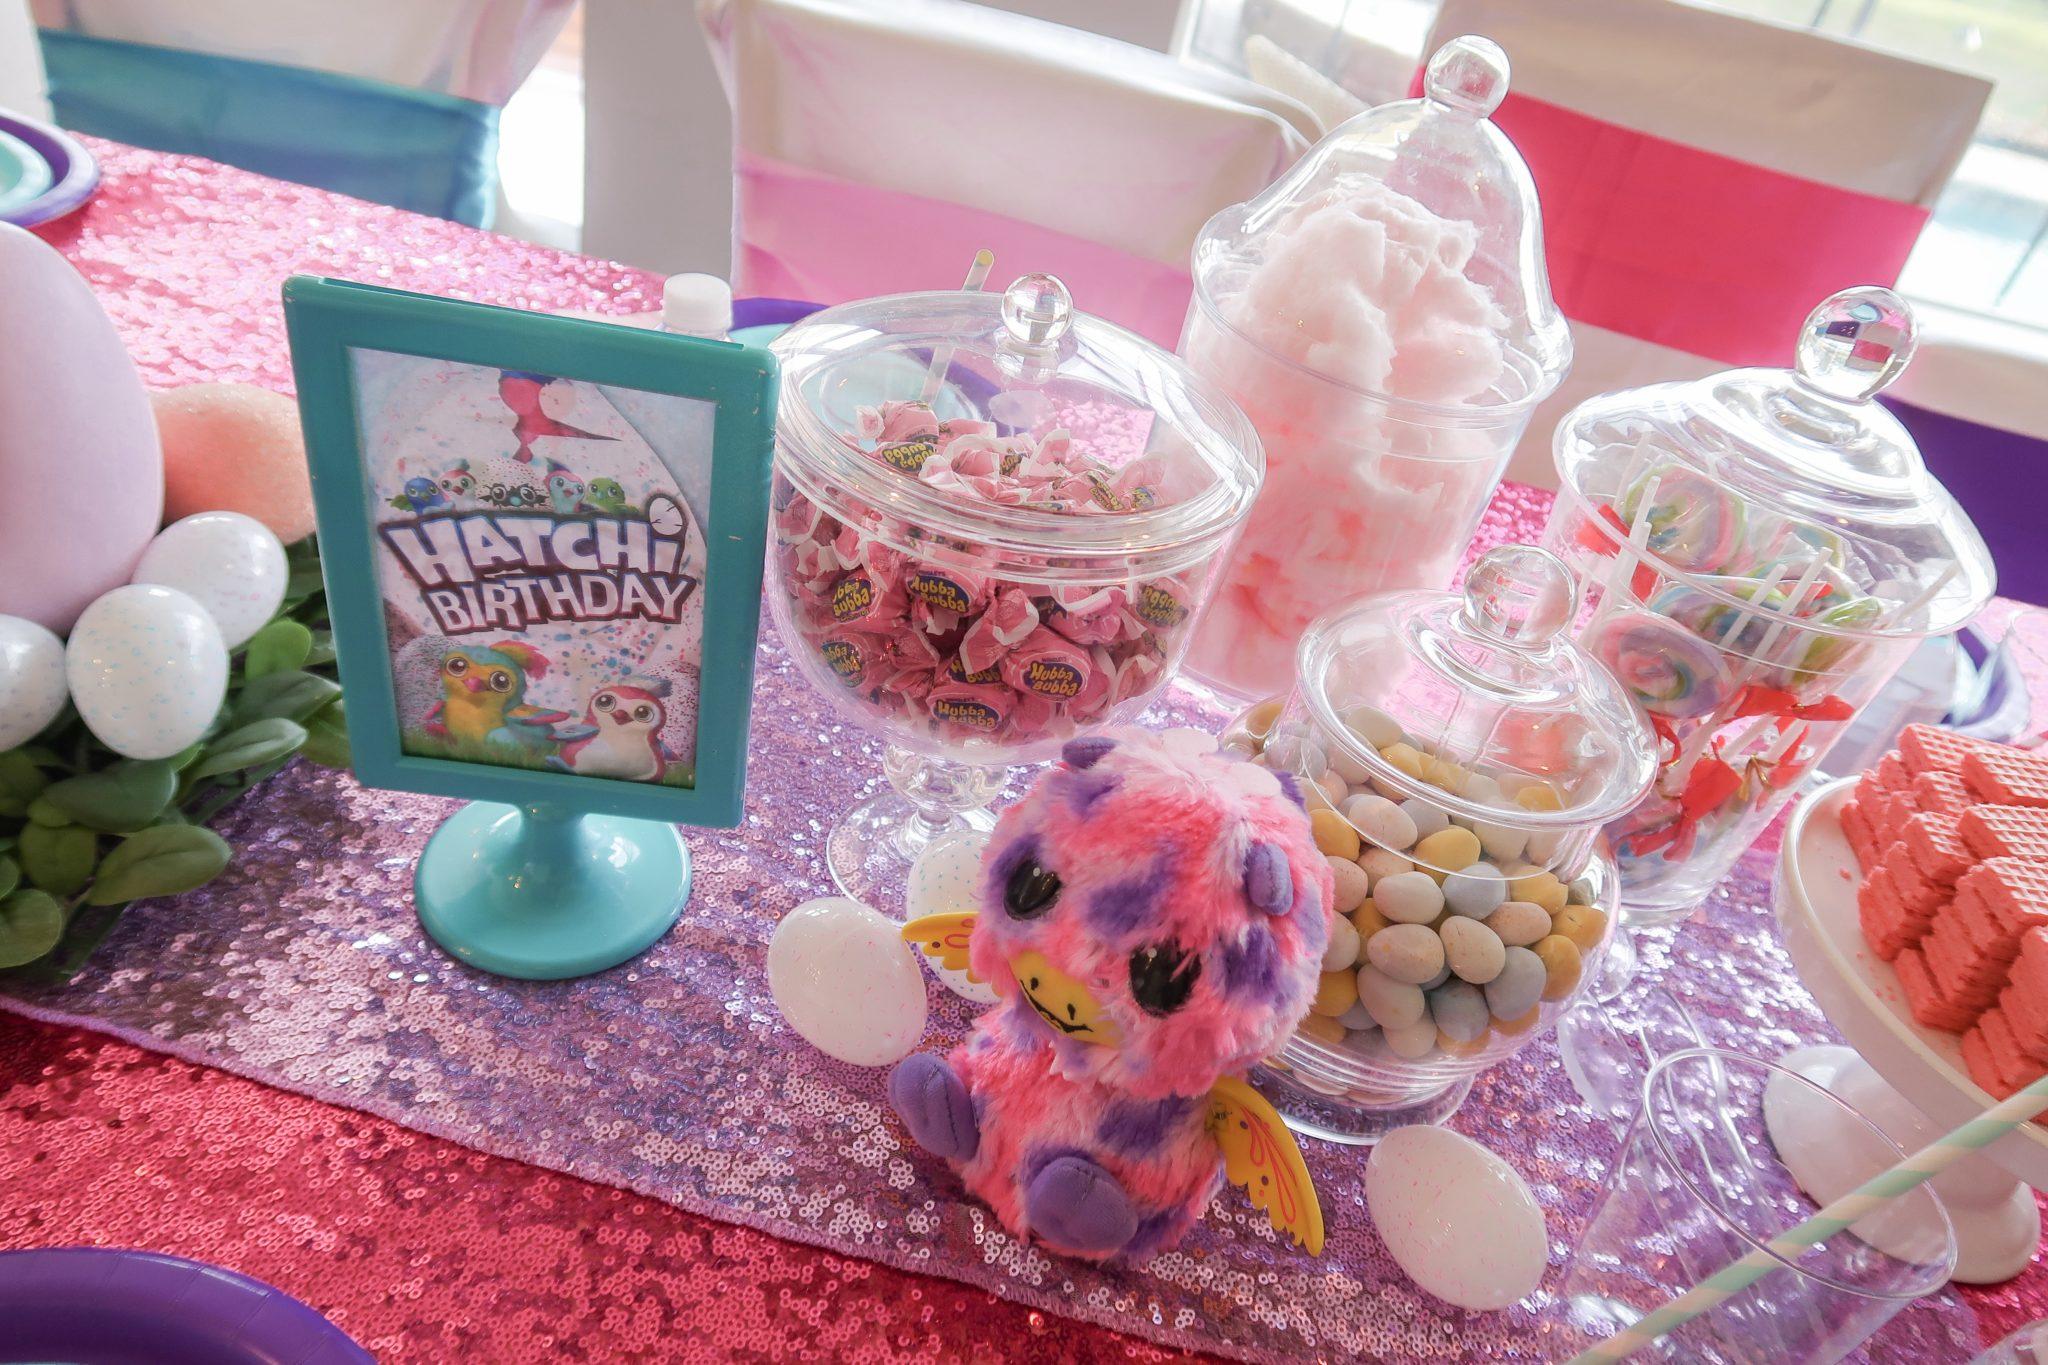 Mesa de dulces para fiesta temática infantil de hatchimals